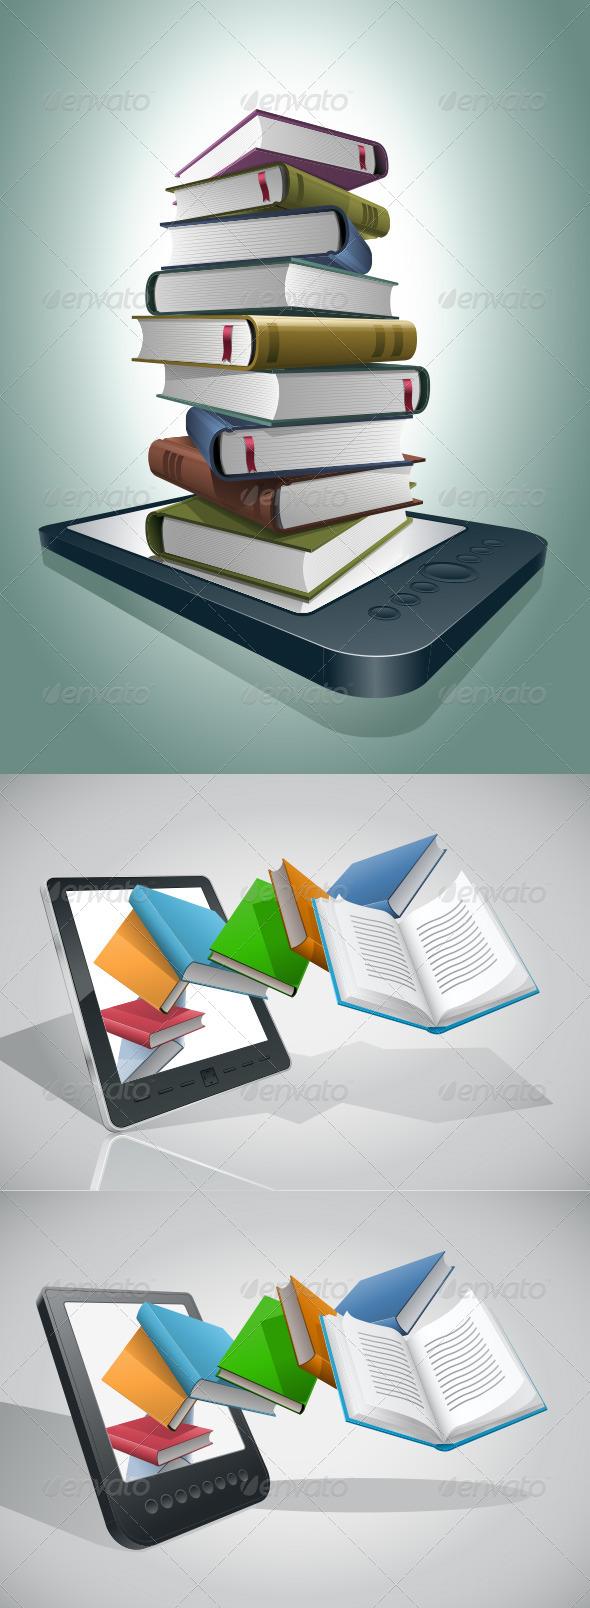 E-book Reader And Books Collection - Technology Conceptual